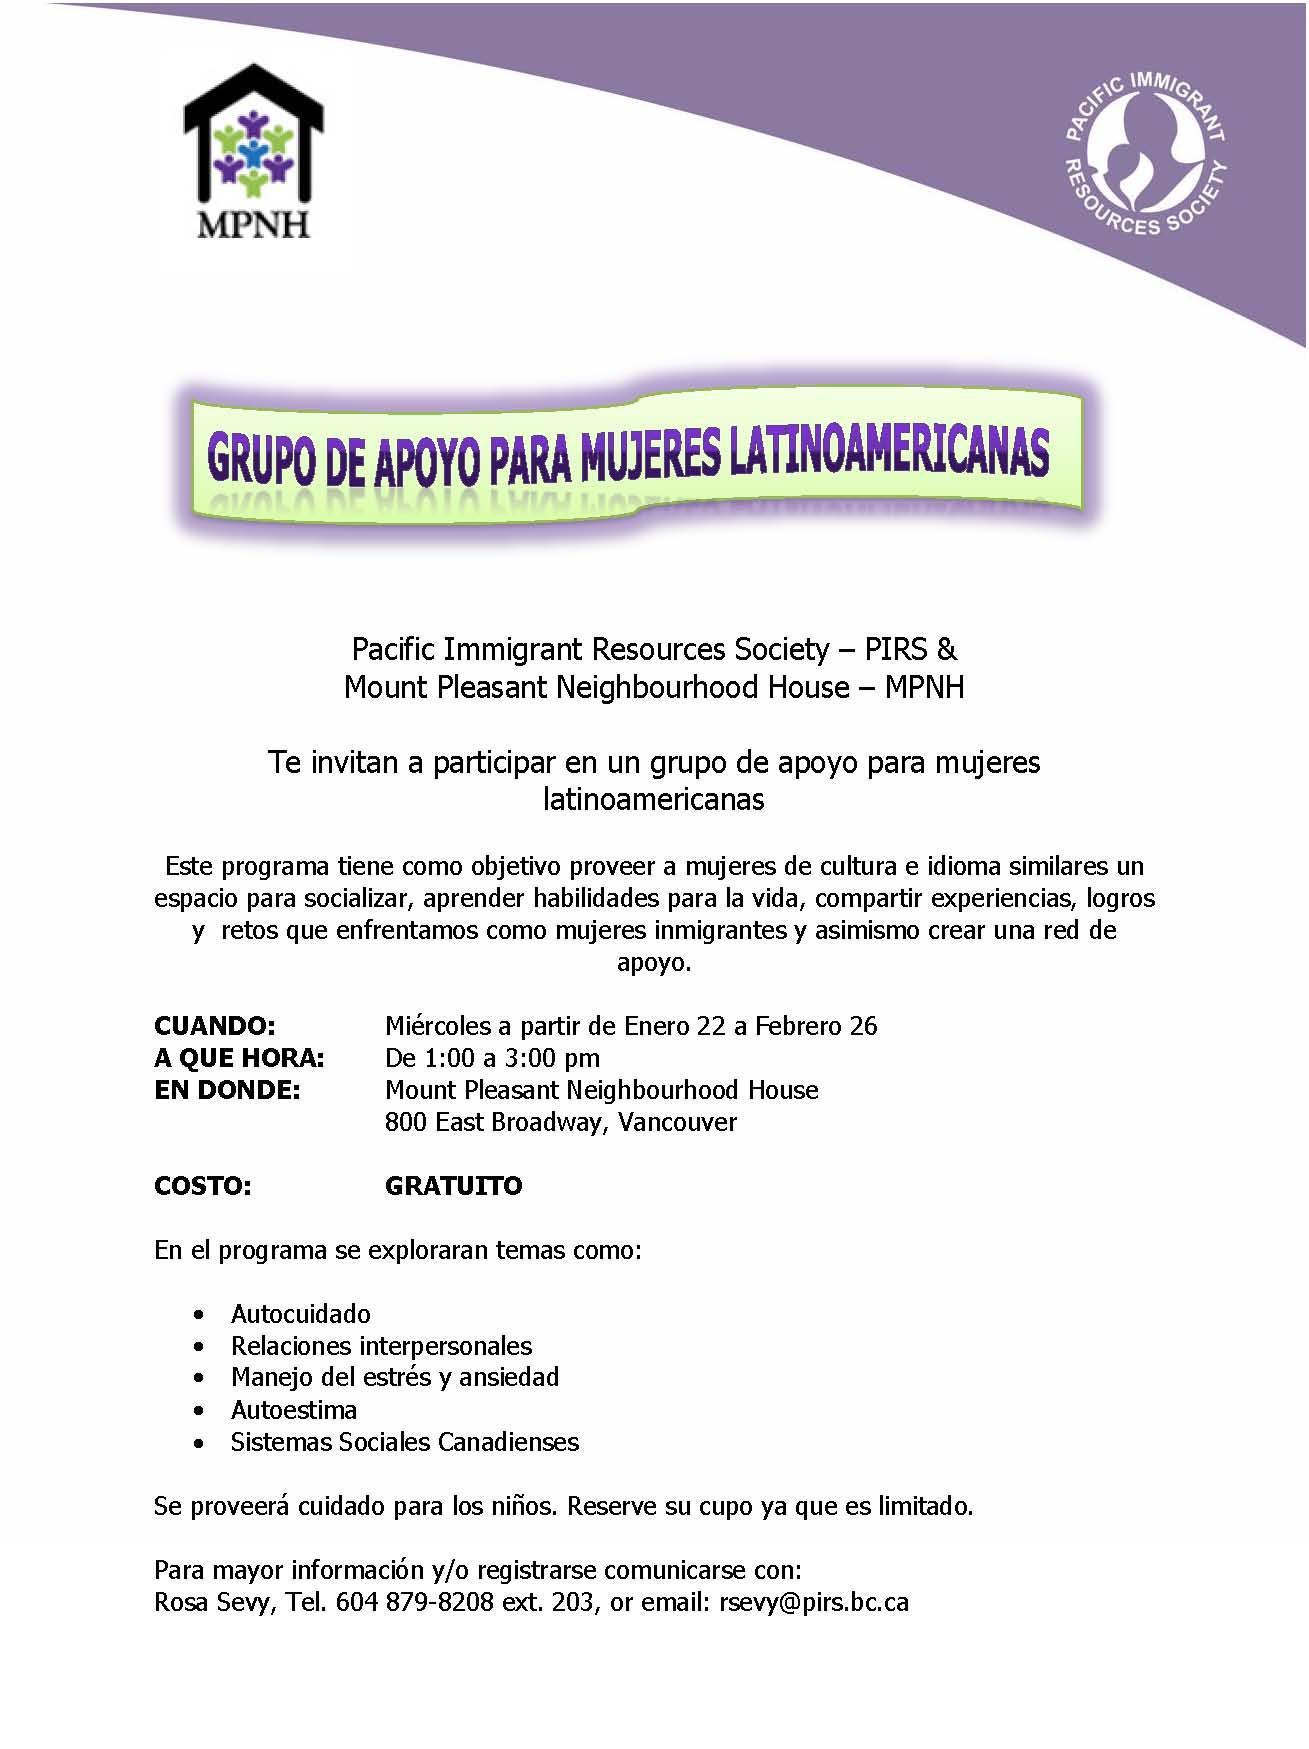 Poster Spanish Speaking Group MPNH 2014